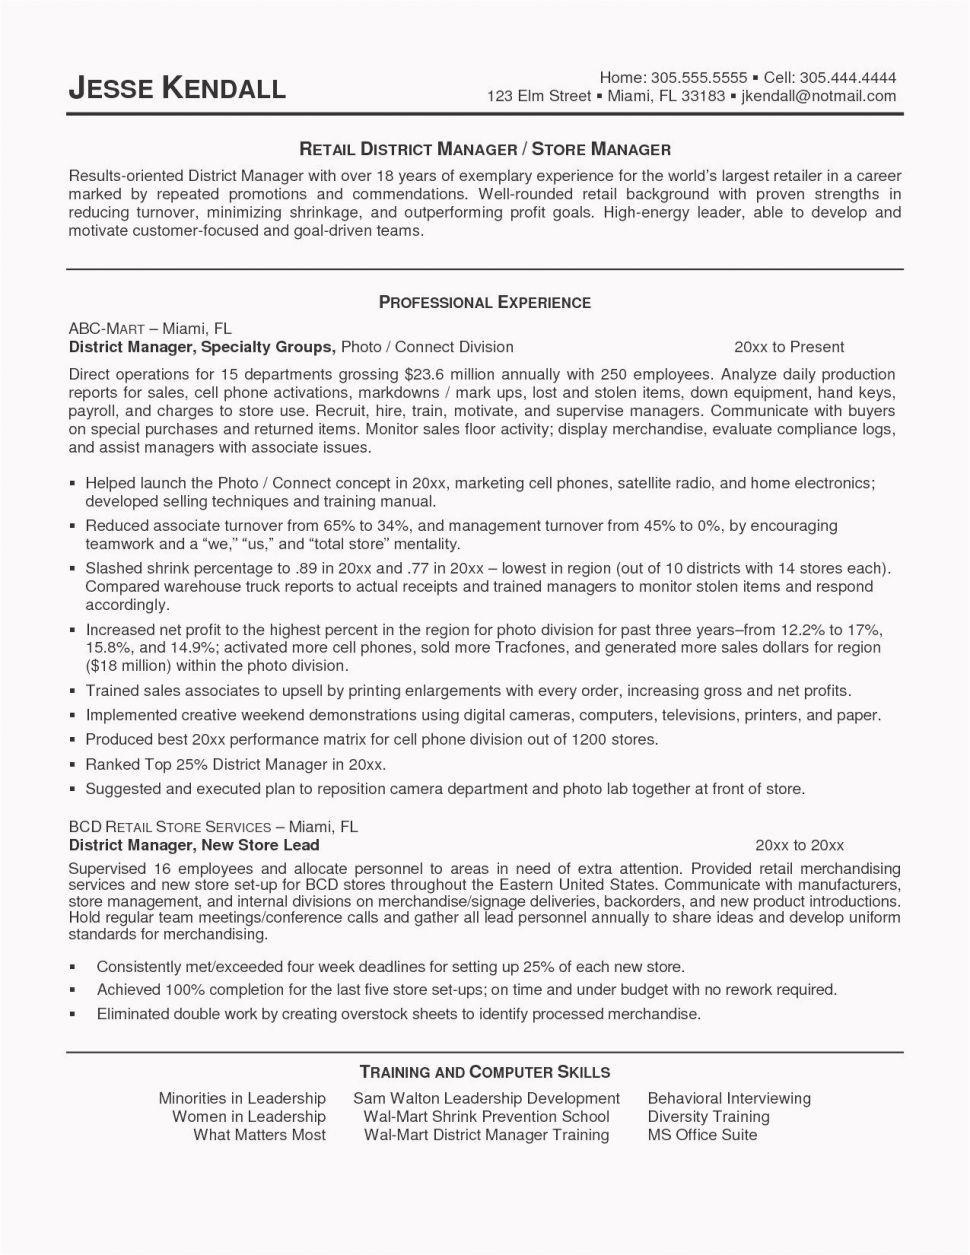 Warehouse Resume Template Free 2019 Warehouse Manager Resume Templates 2020 Warehouse Clerk Resume Templates Job Resume Examples Acting Resume Resume Examples